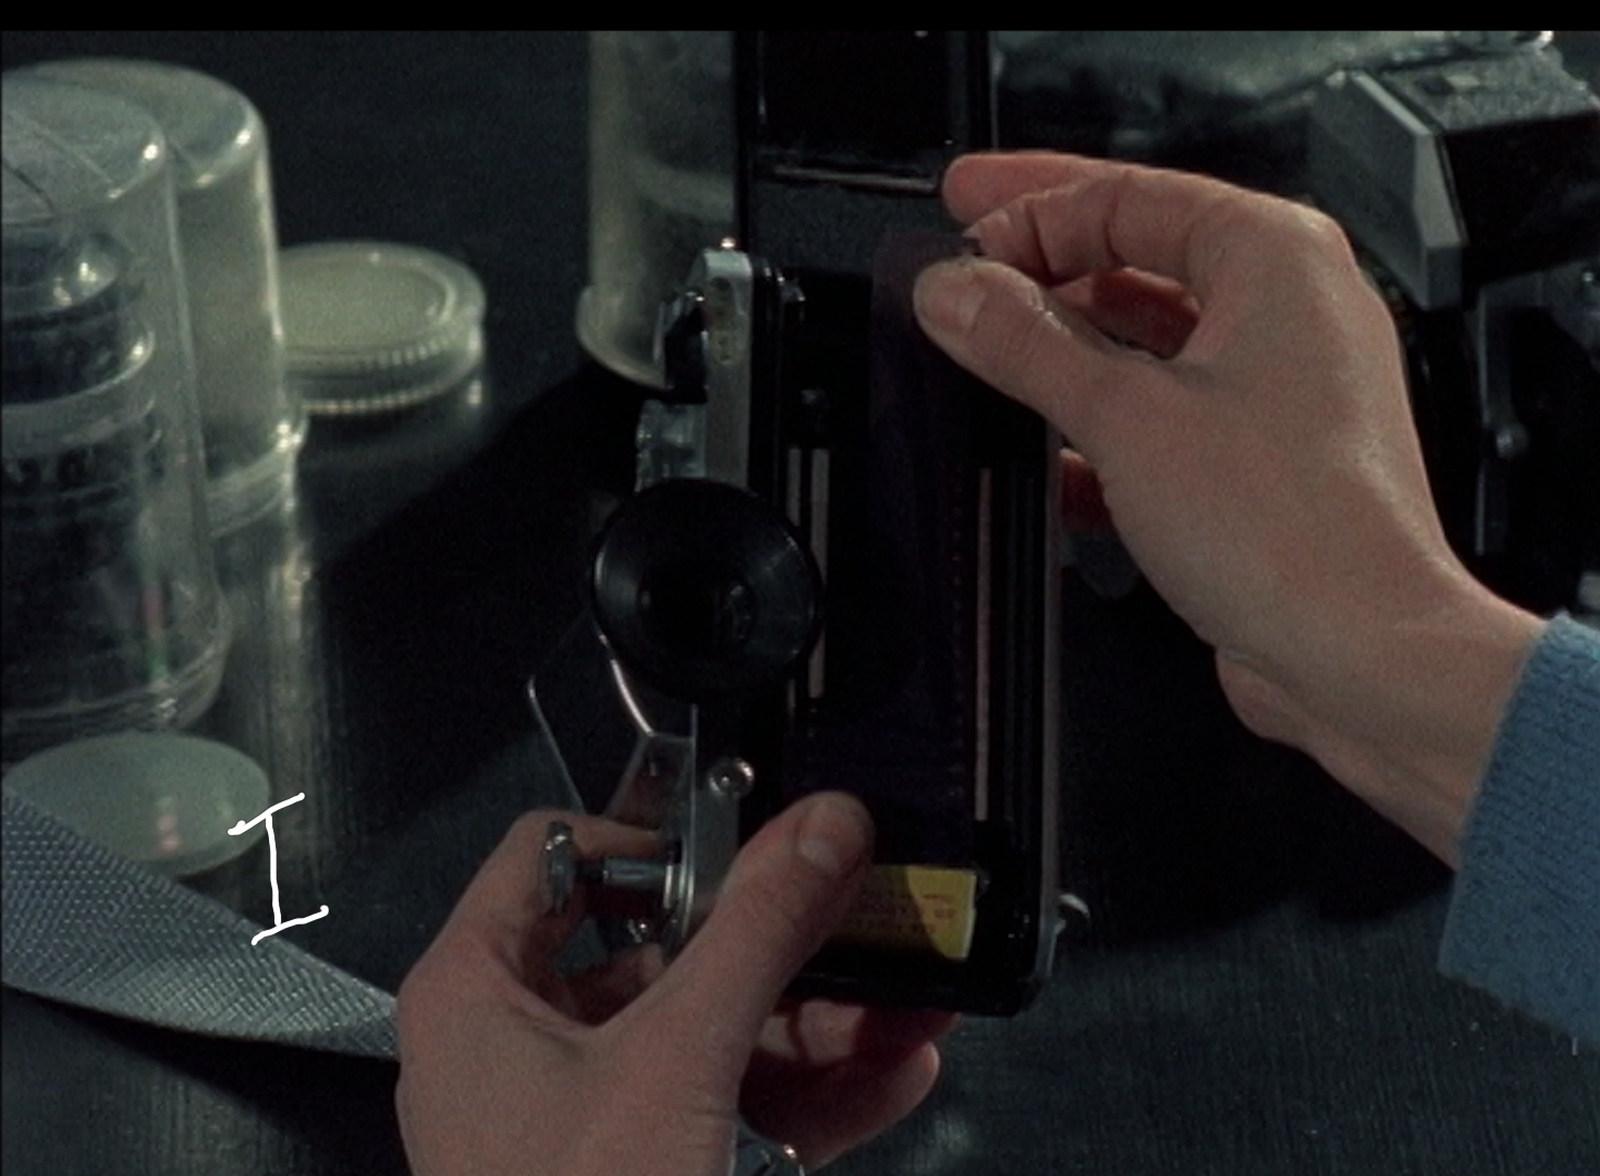 2_-Film-Je-Nous-I_or_Eye_Us-Nov24-I_handsSaskia-1004004-C